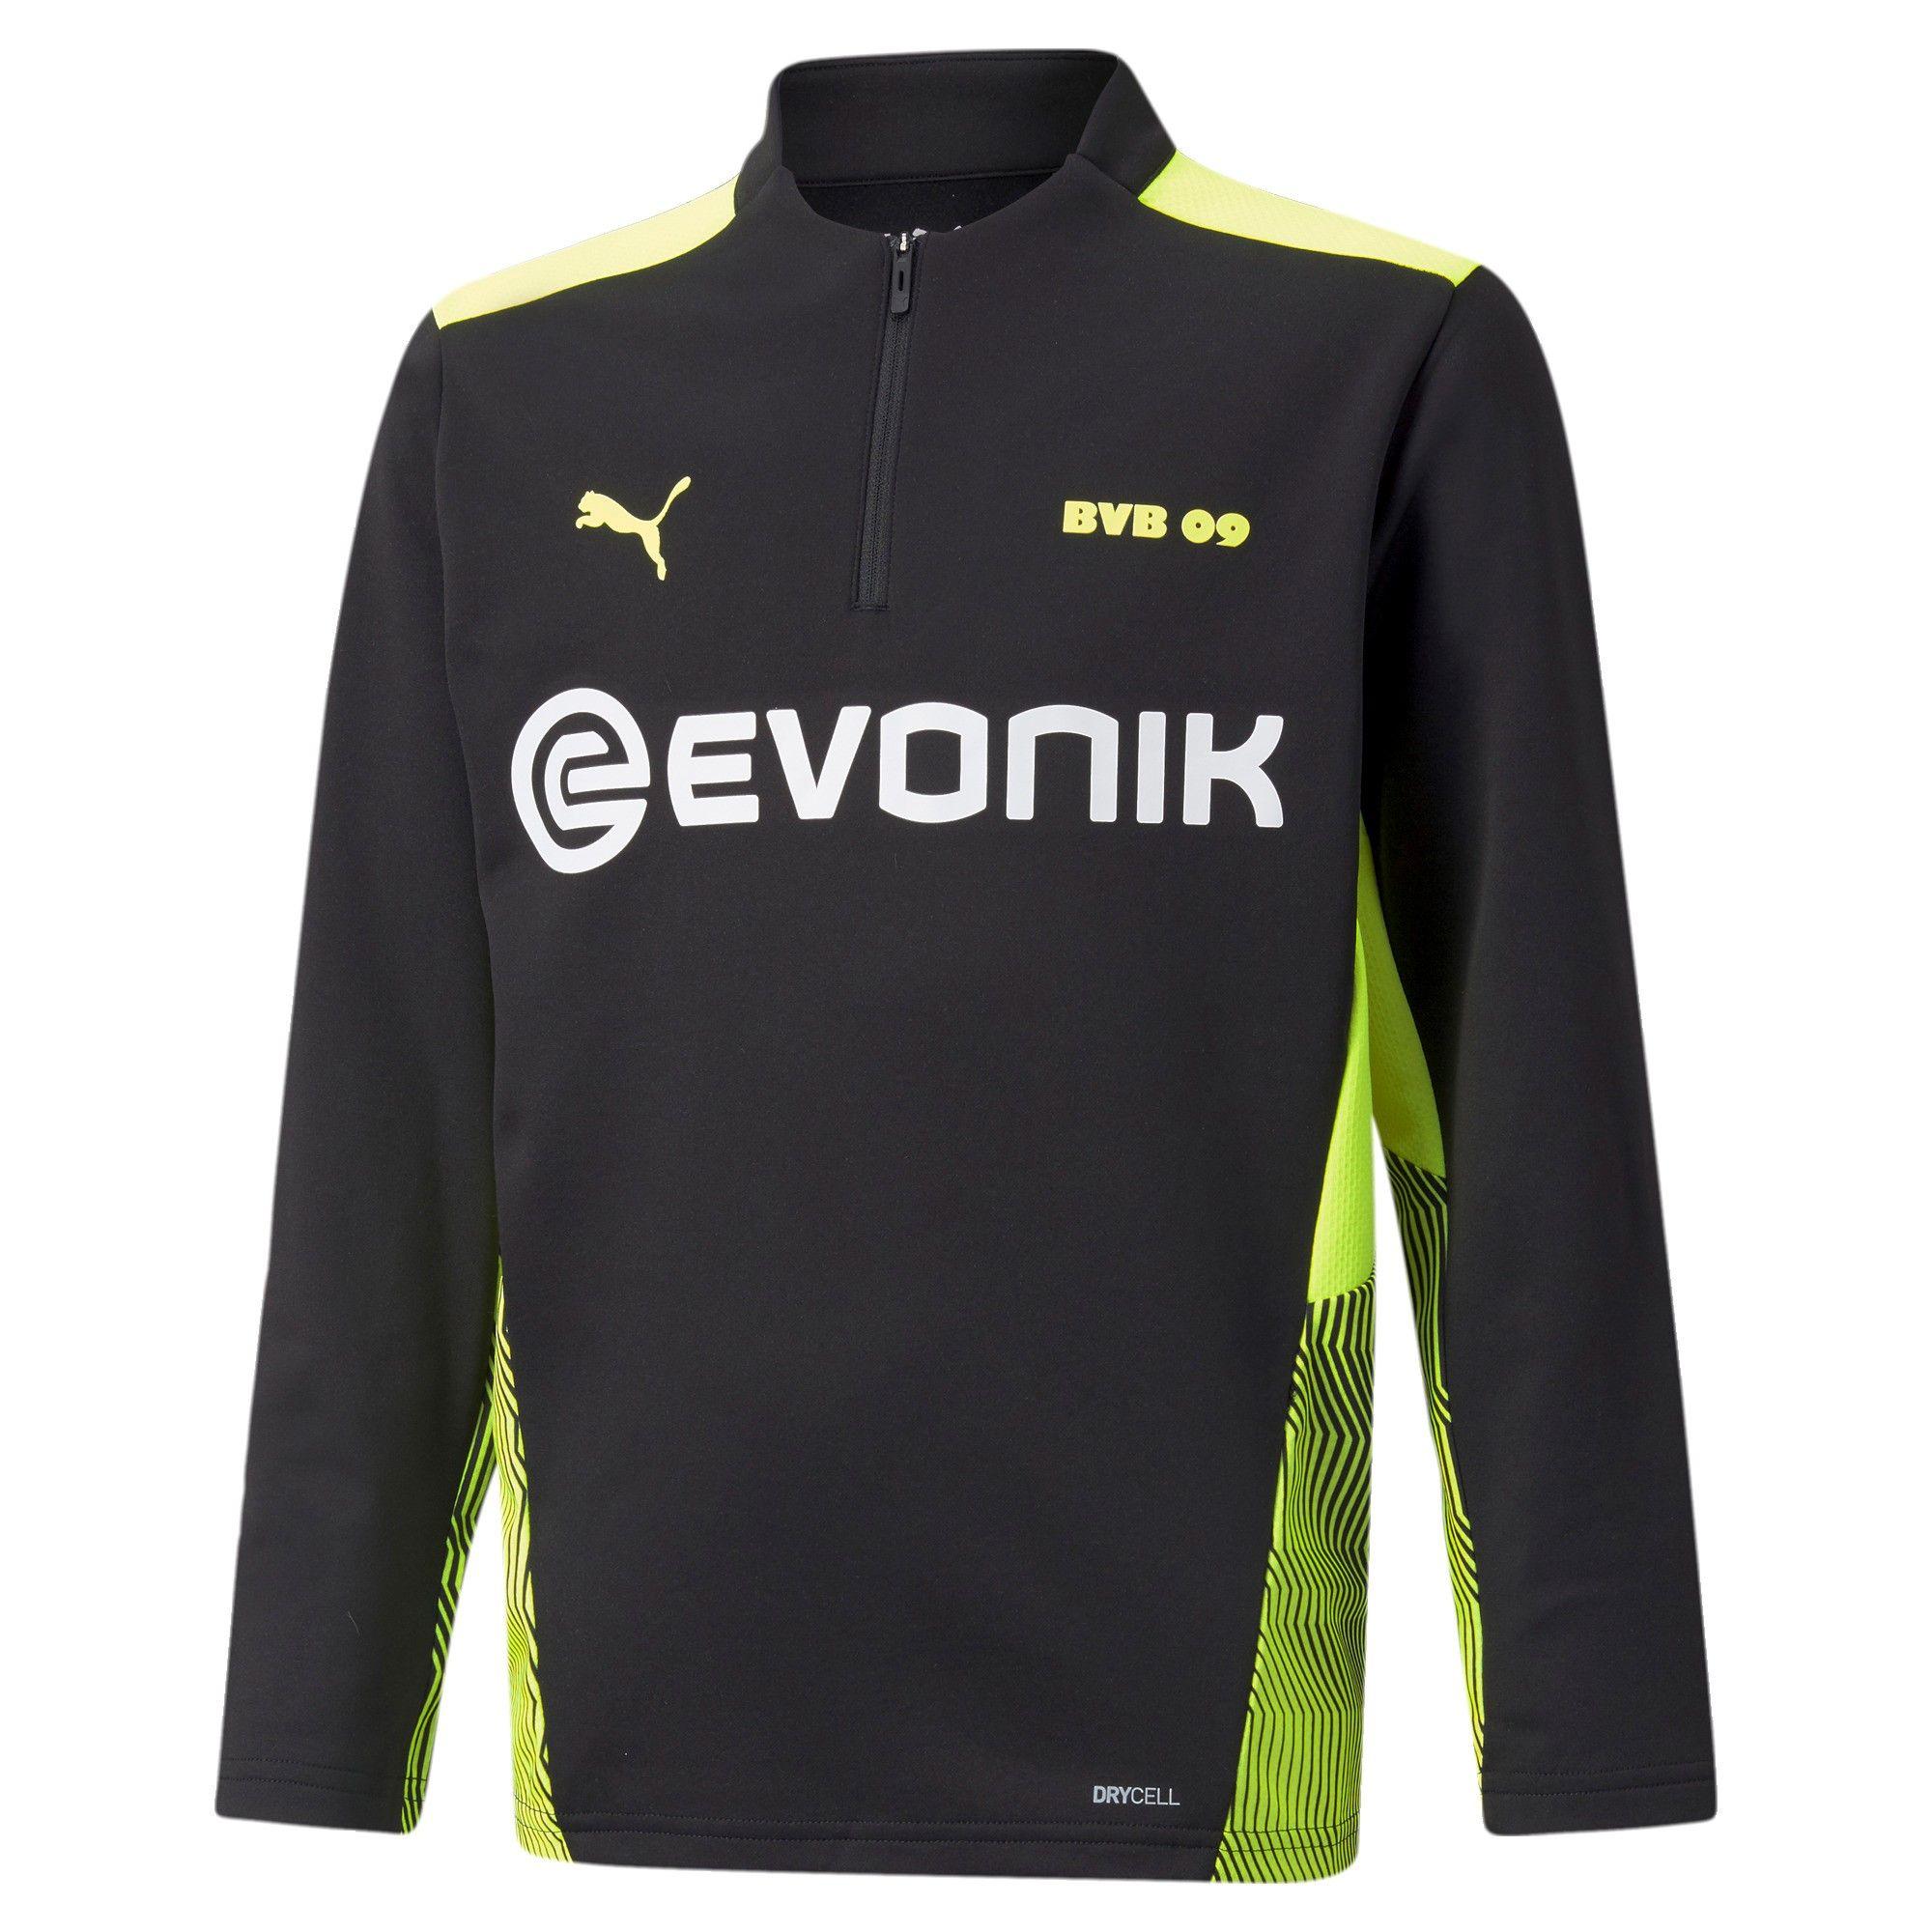 PUMA Borussia Dortmund 1/4 Zip Trainingstrui 2021-2022 Kids Zwart Geel